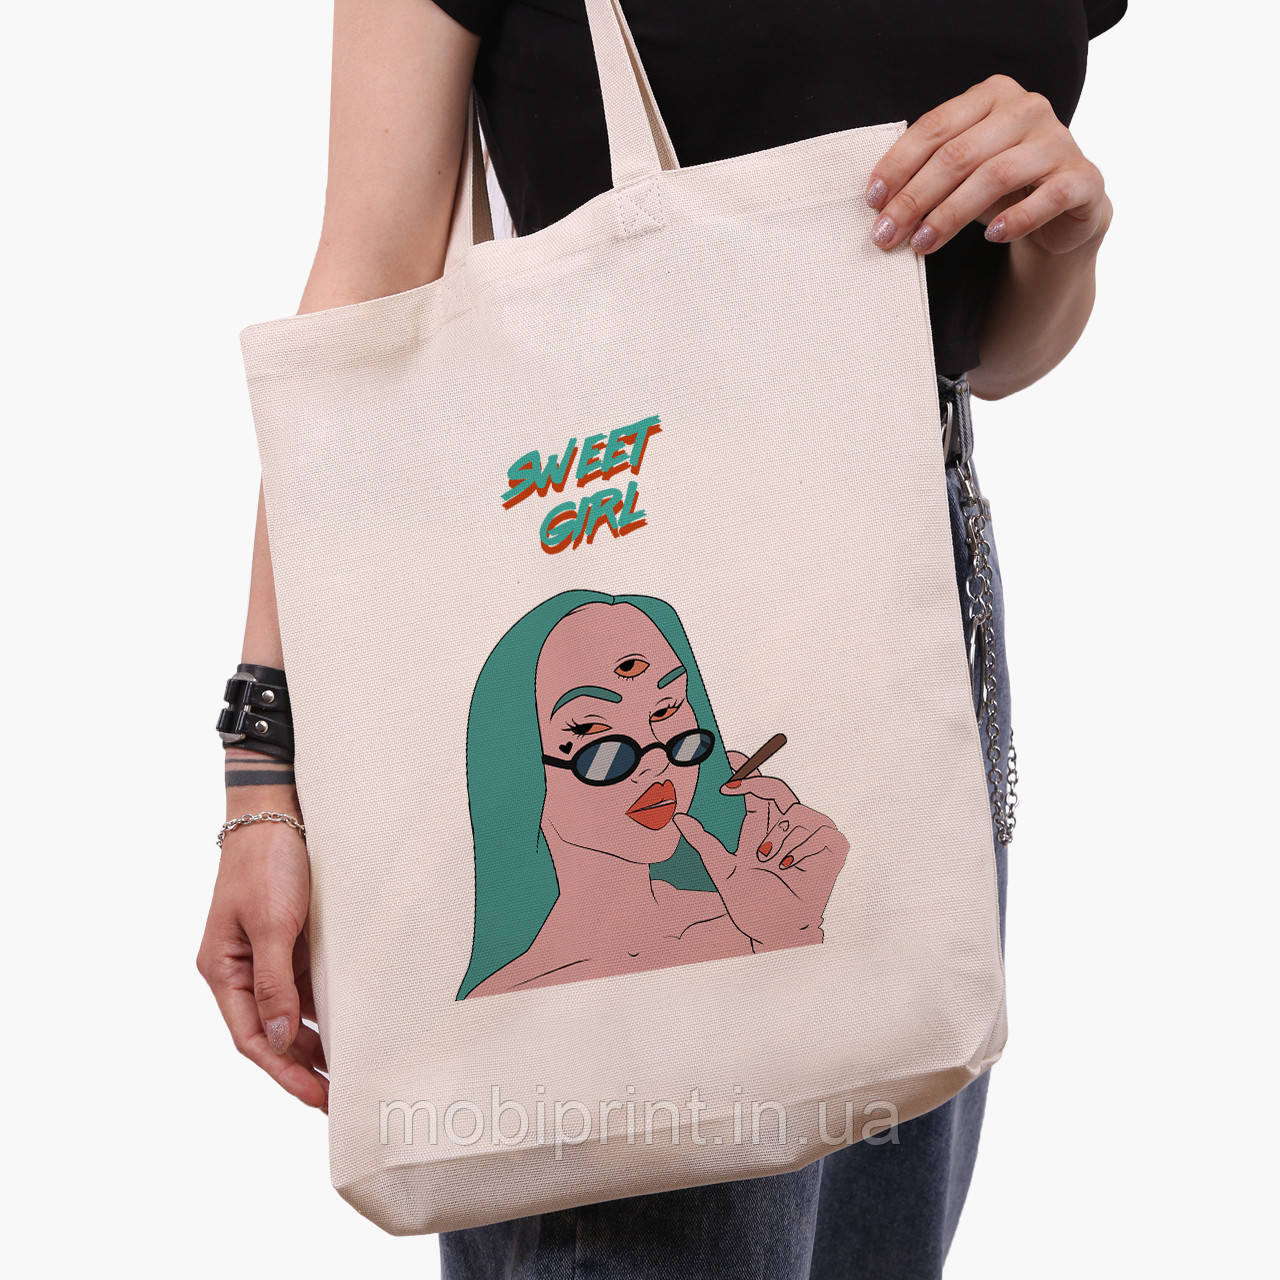 Еко сумка шоппер біла Мила дівчина Діджитал Арт (Sweet girl) (9227-1638-1) экосумка шопер 41*39*8 см